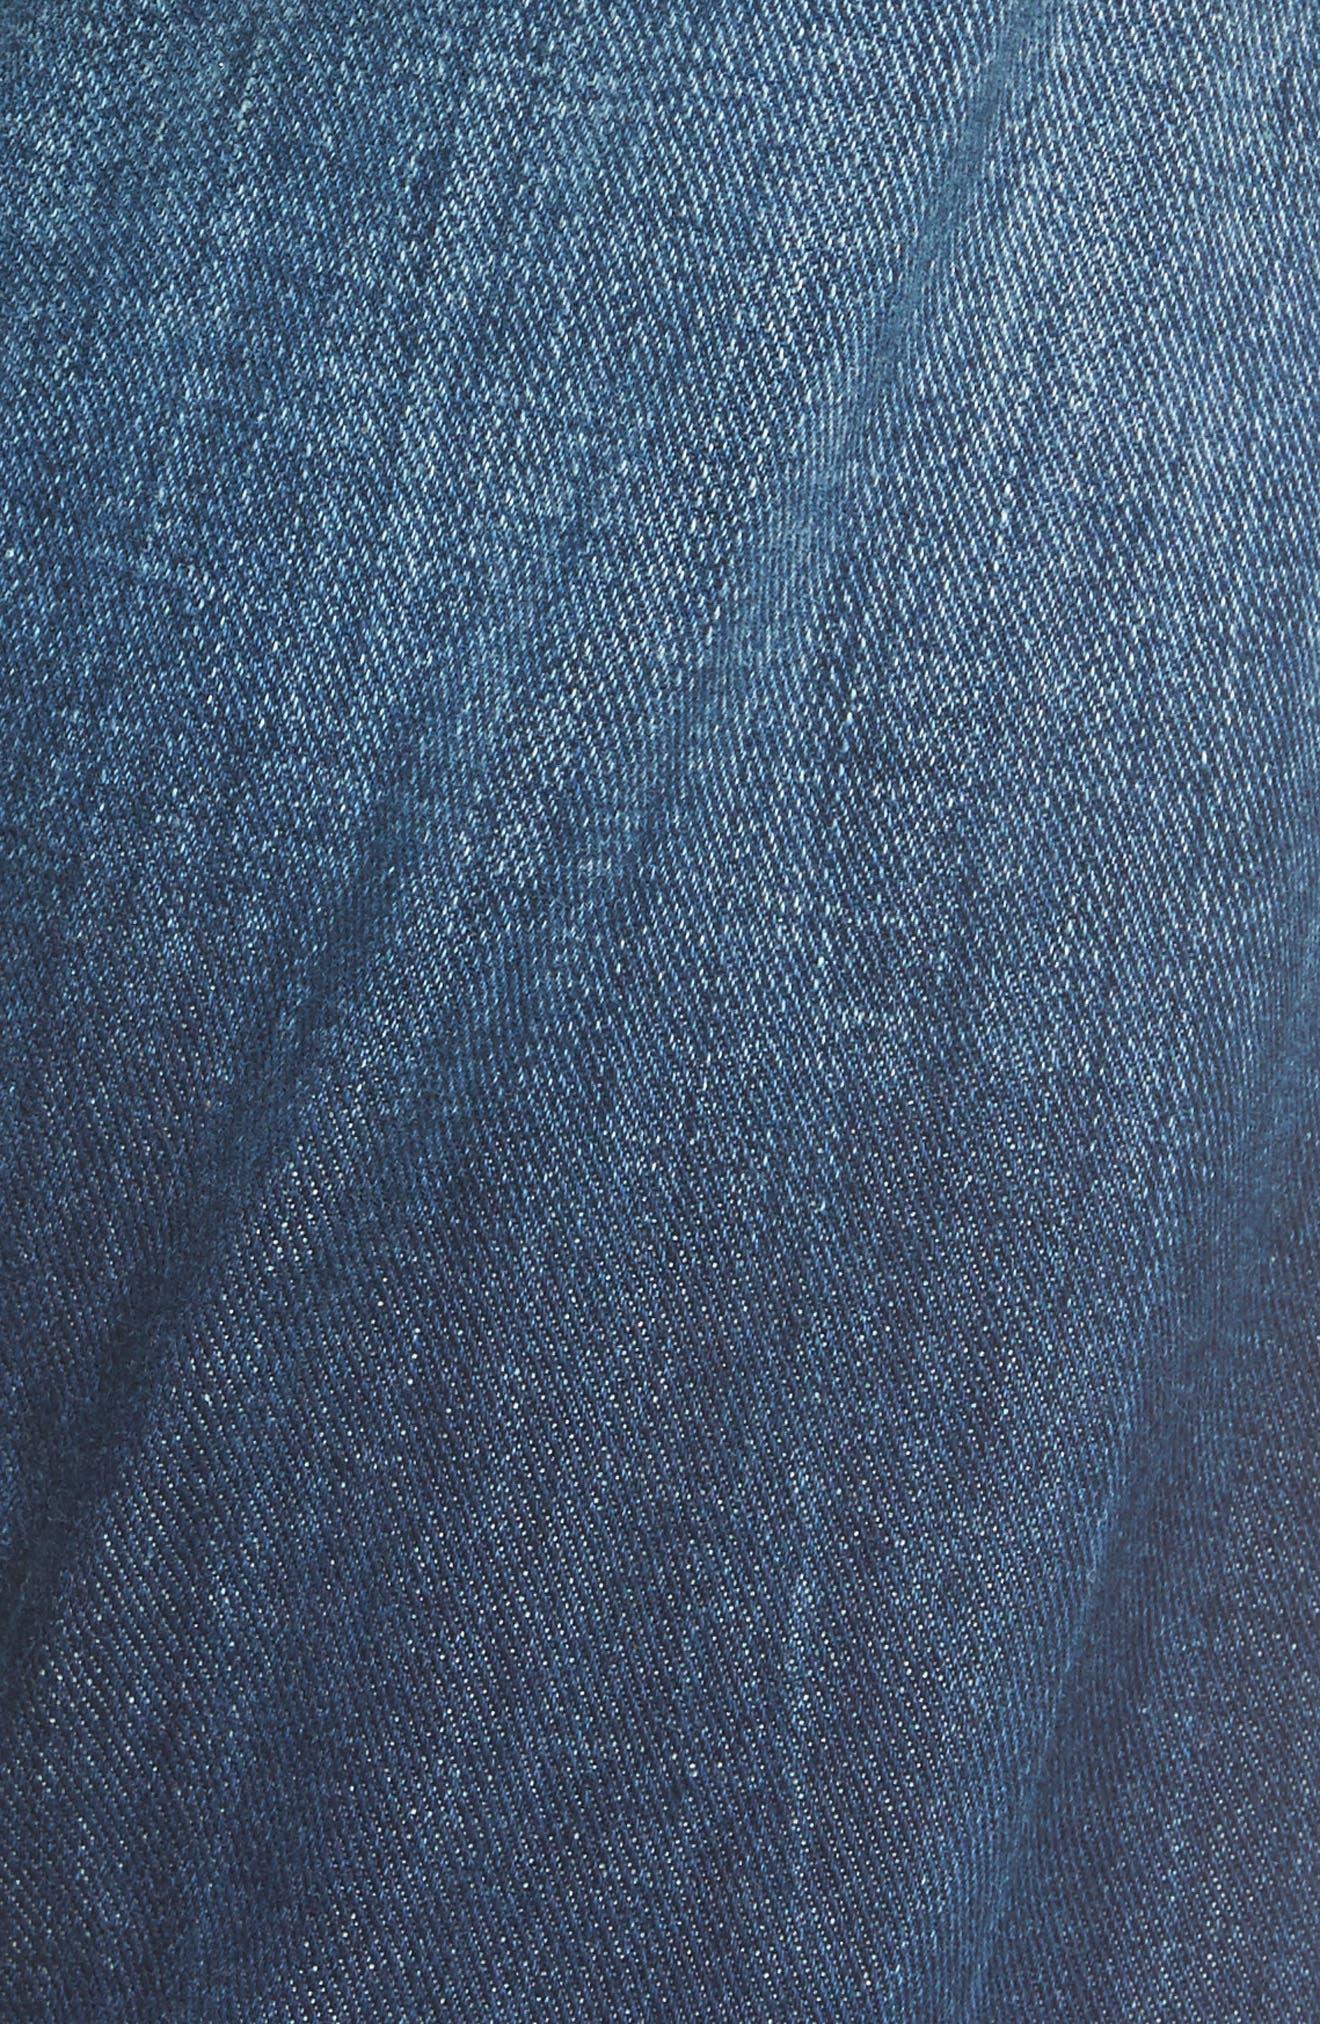 Cameron Destroyed Boyfriend Jeans,                             Alternate thumbnail 5, color,                             Celestial Sky